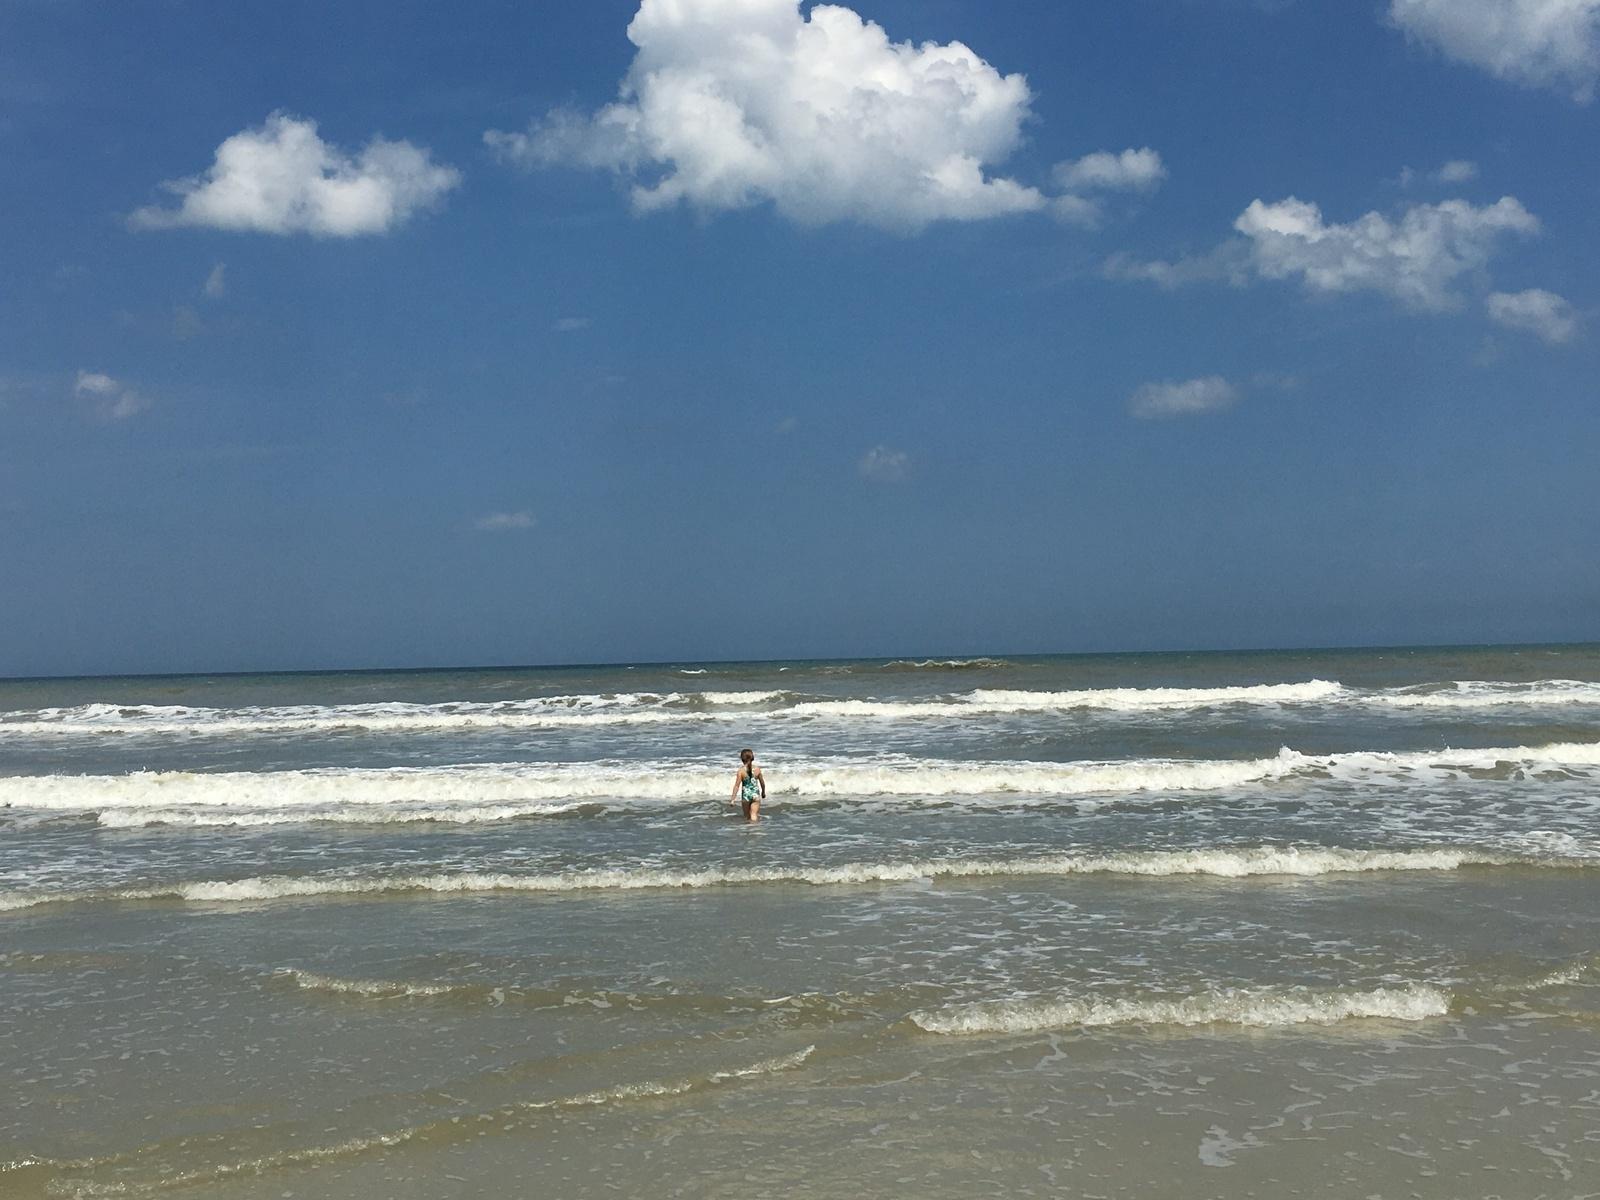 Hotel Deals New Smyrna Beach Fl